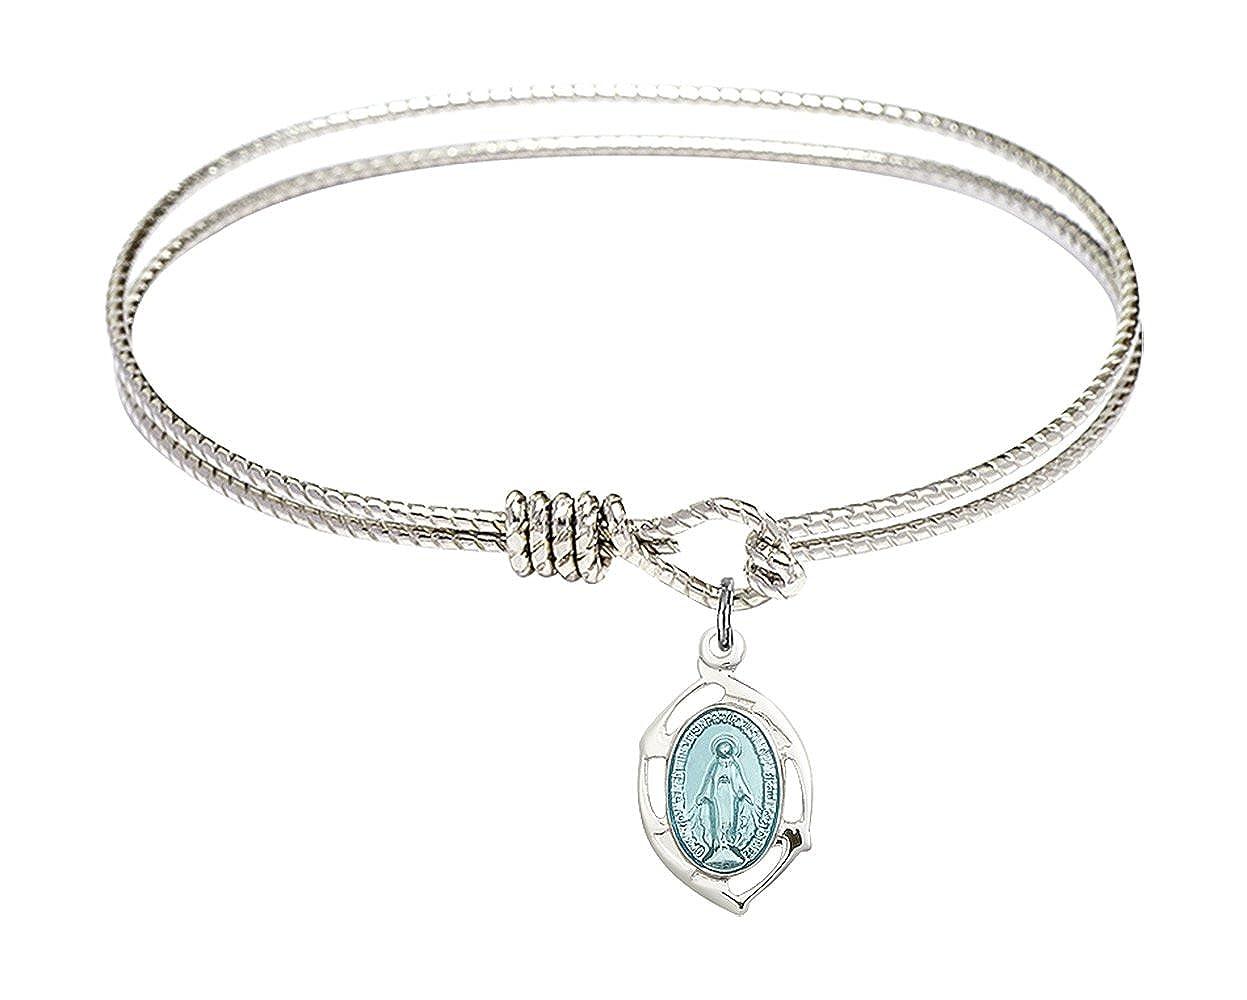 DiamondJewelryNY Eye Hook Bangle Bracelet with a Miraculous Leaf Charm.